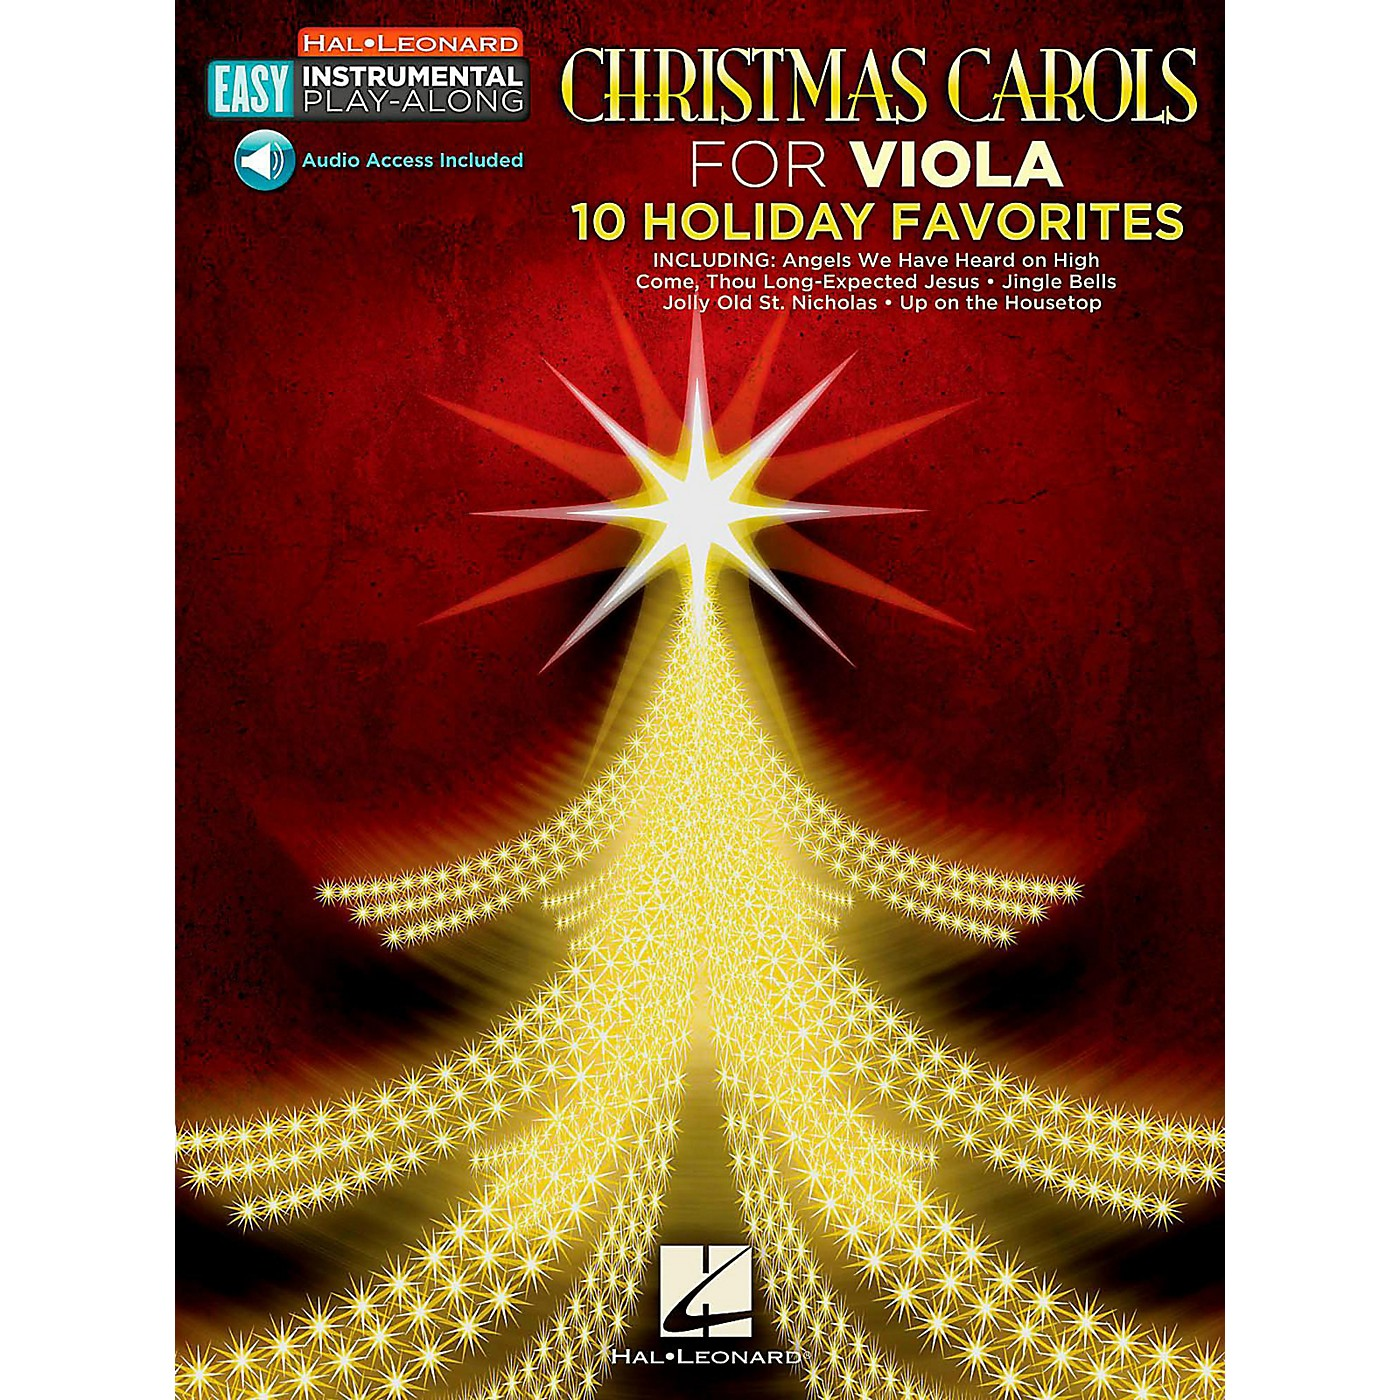 Hal Leonard Christmas Carols - Viola - Easy Instrumental Play-Along (Audio Online) thumbnail